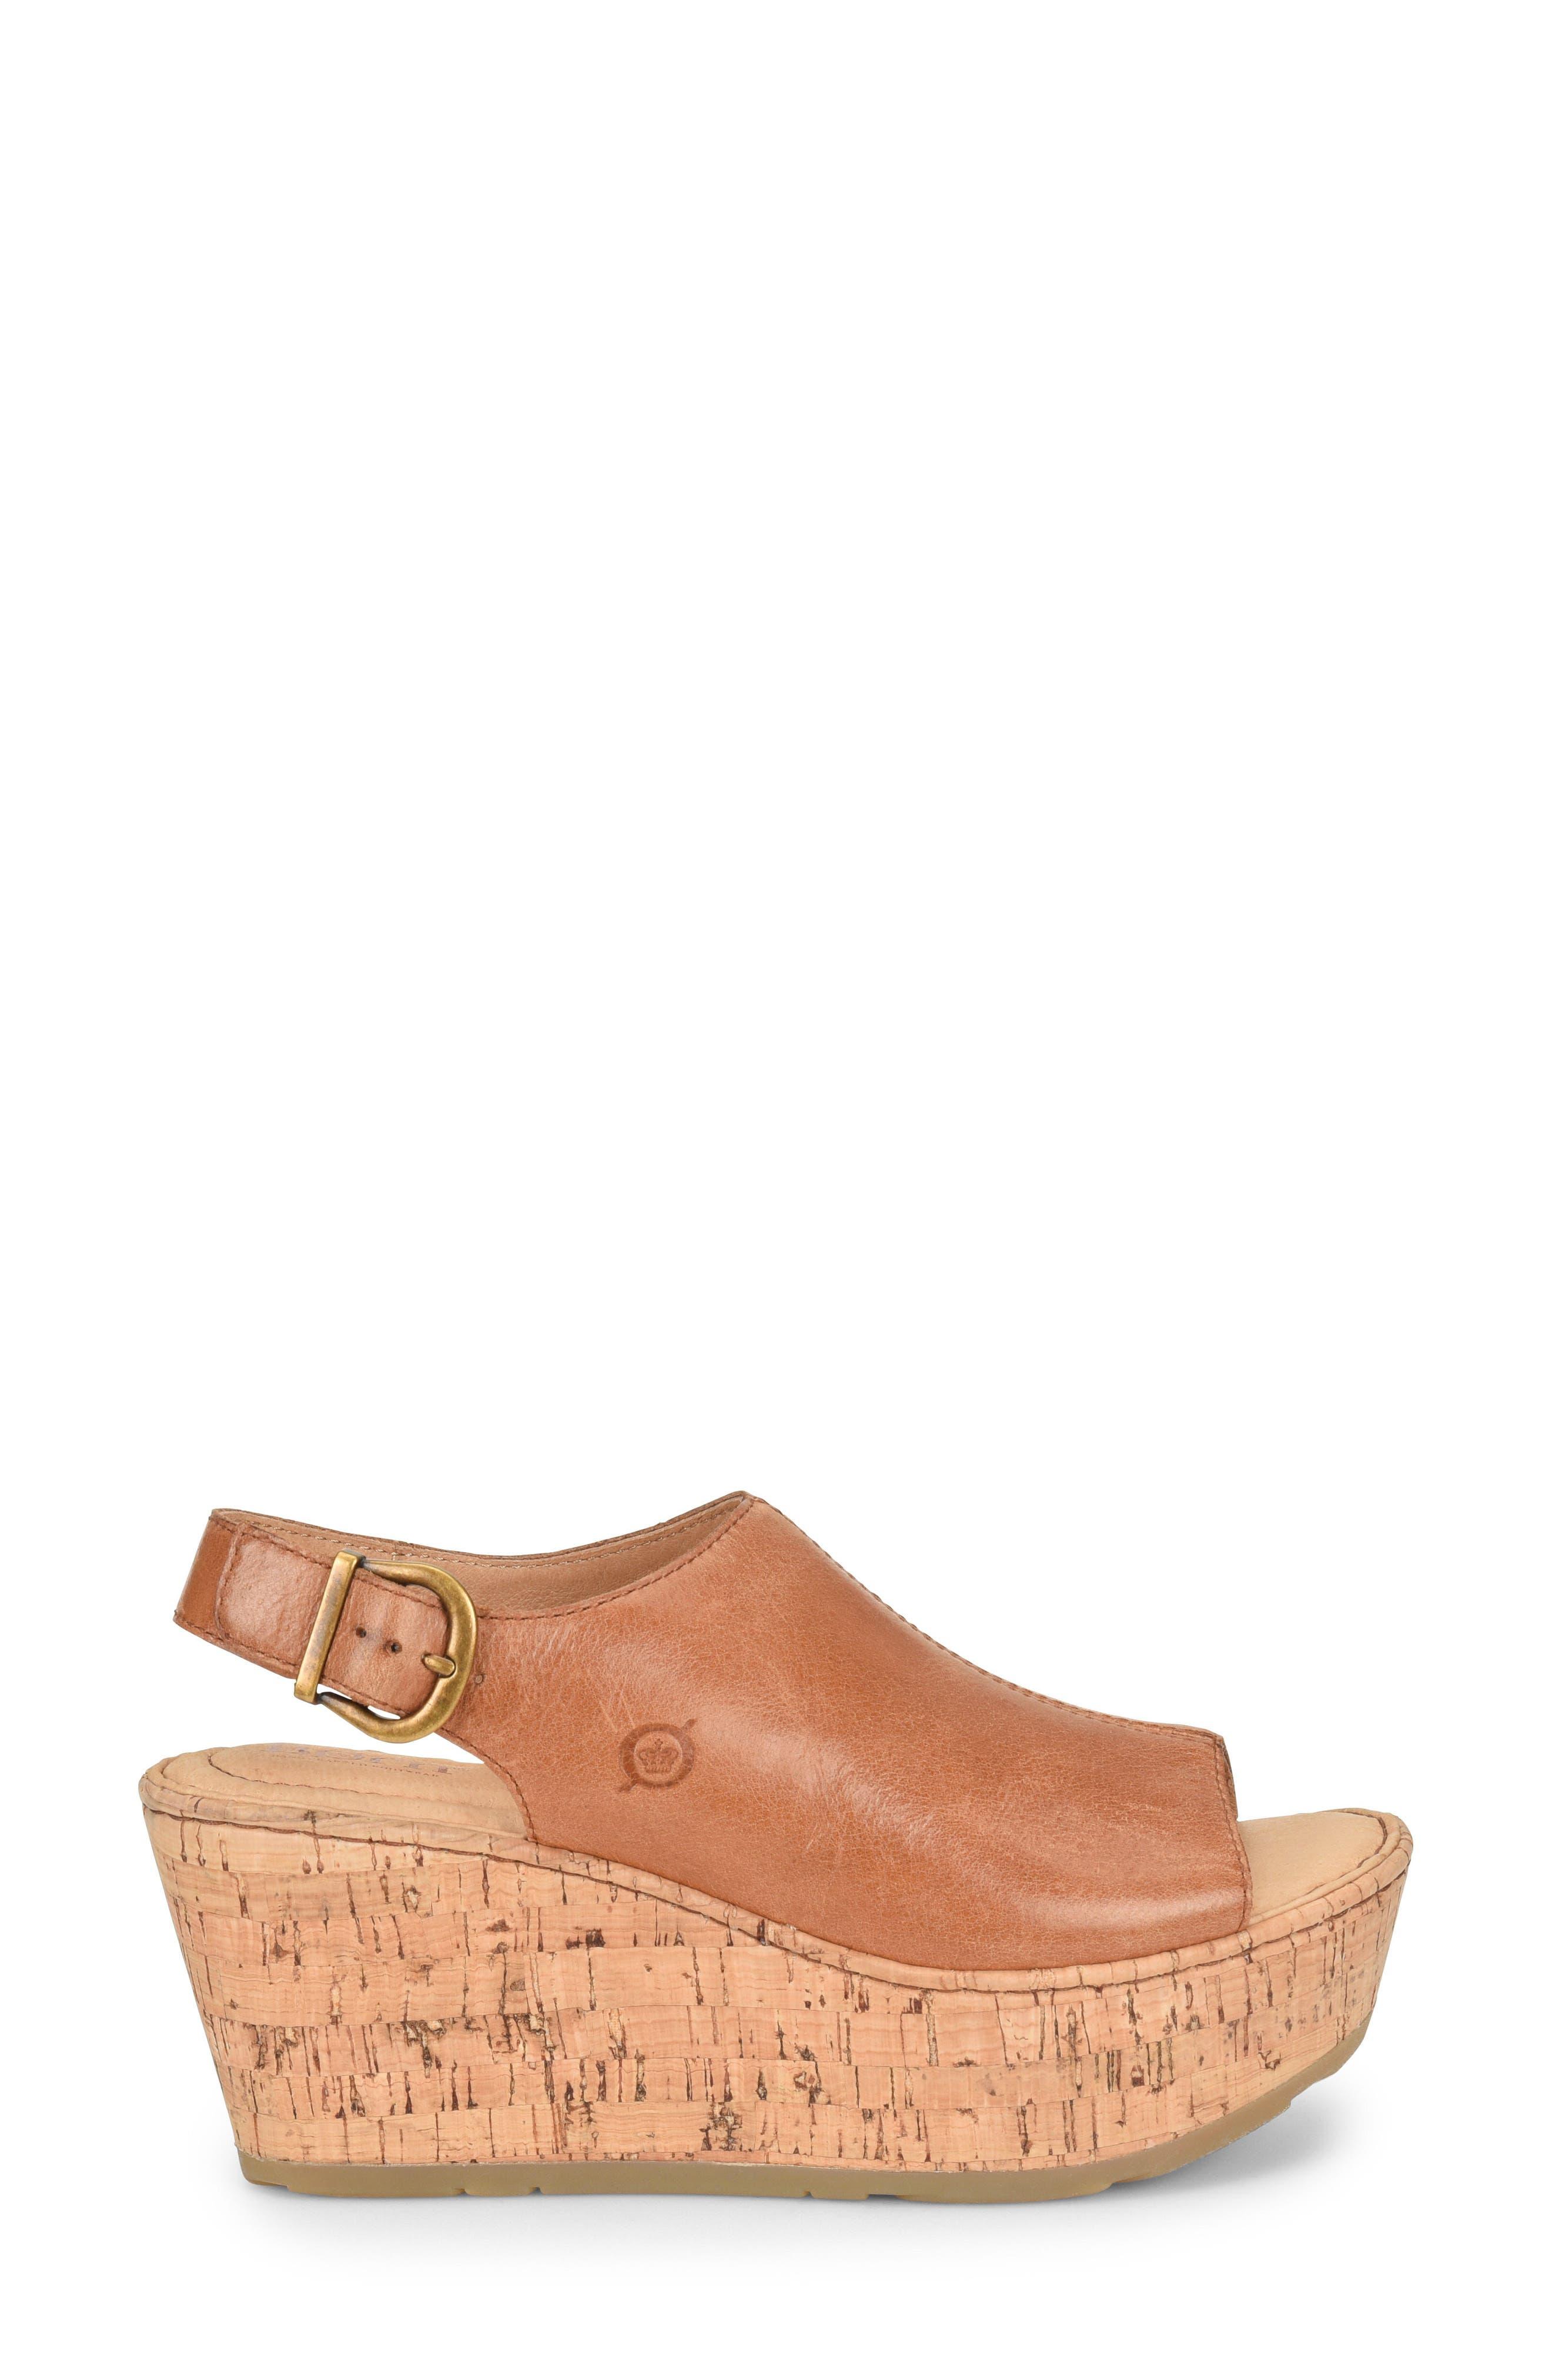 Orbit Platform Wedge Sandal,                             Alternate thumbnail 3, color,                             Brown Leather